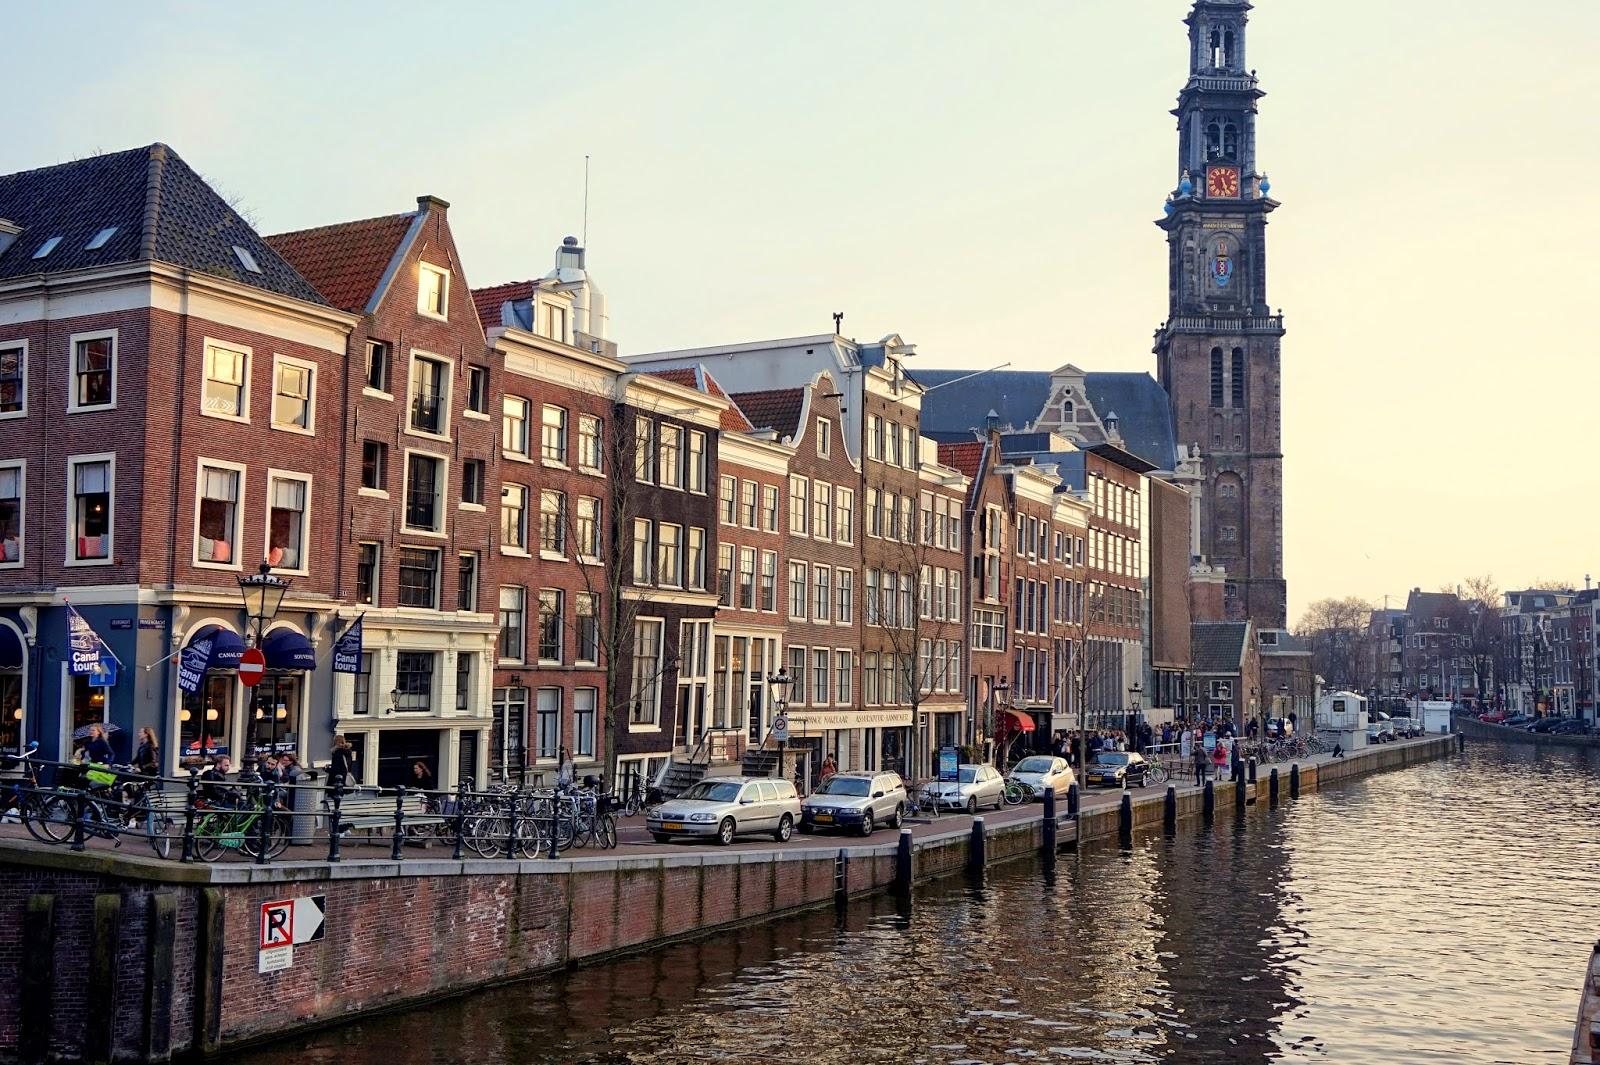 Im Anne Frank Haus in Amsterdam